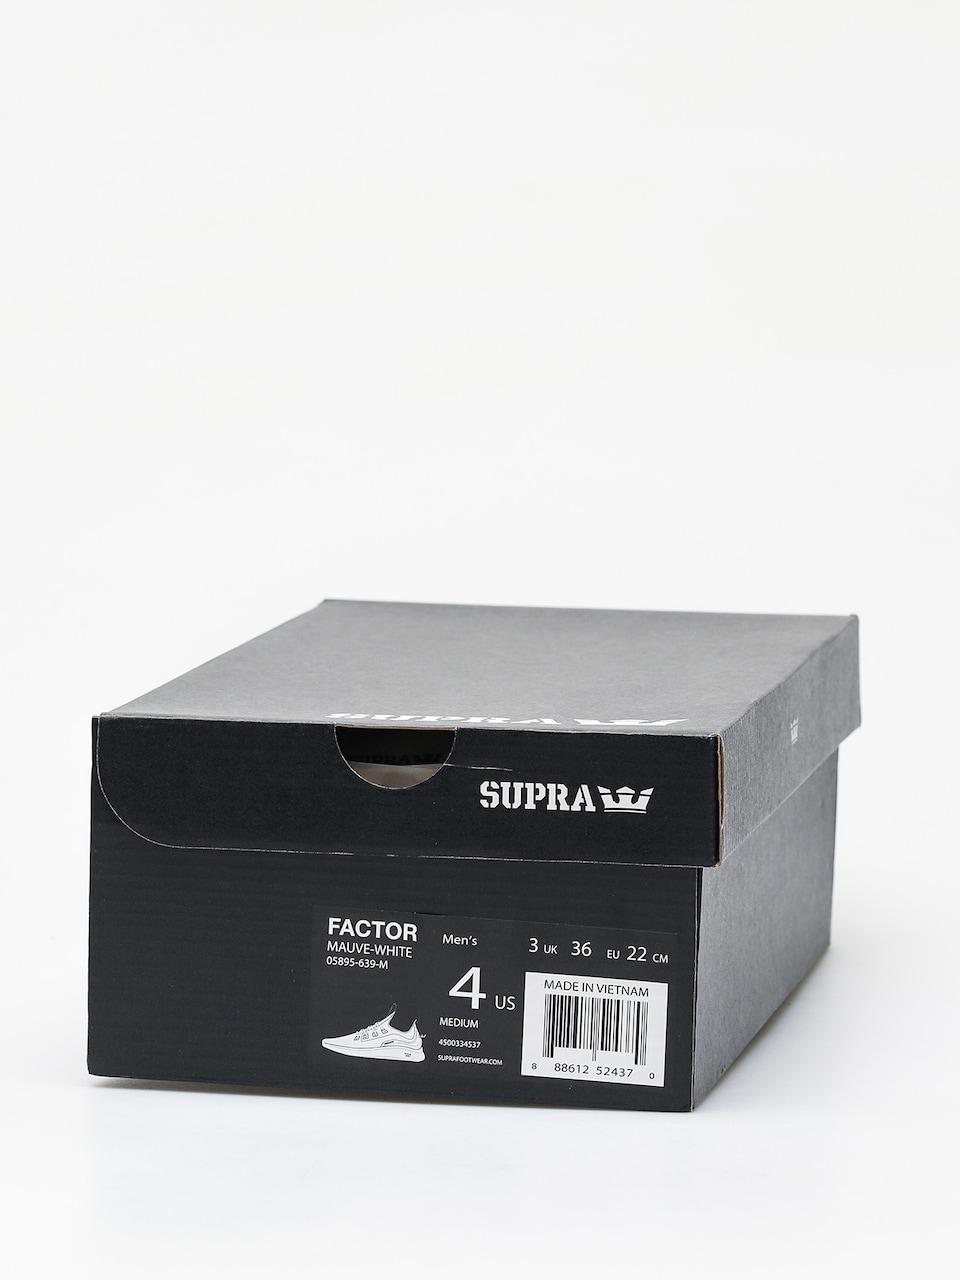 Supra Factor Mens Mauve White Fashion Trainers 8 UK